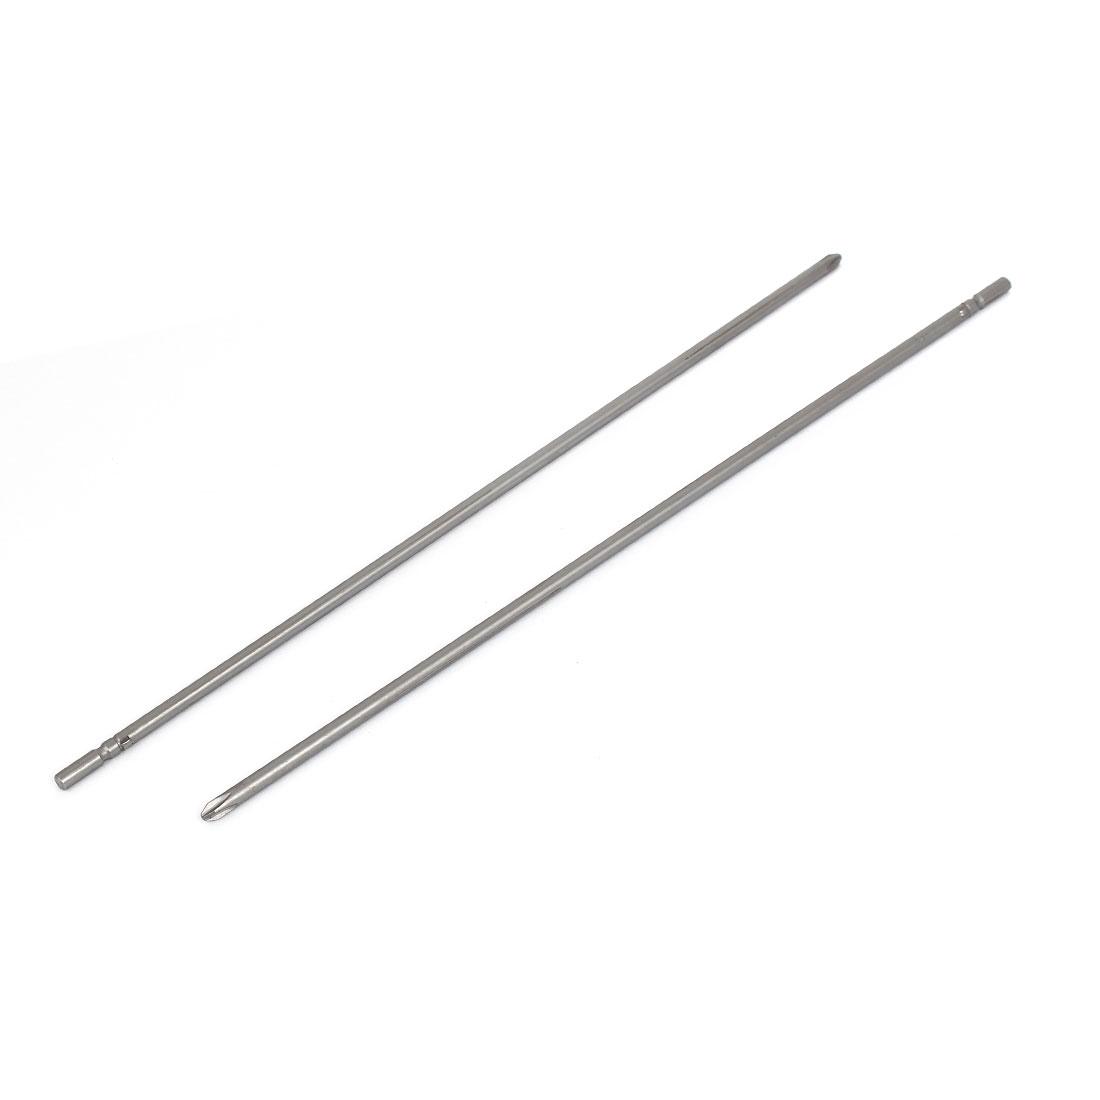 Magnetic PH2 5mm Phillips Cross Head Screwdriver Bit Tool 300mm Length 2pcs